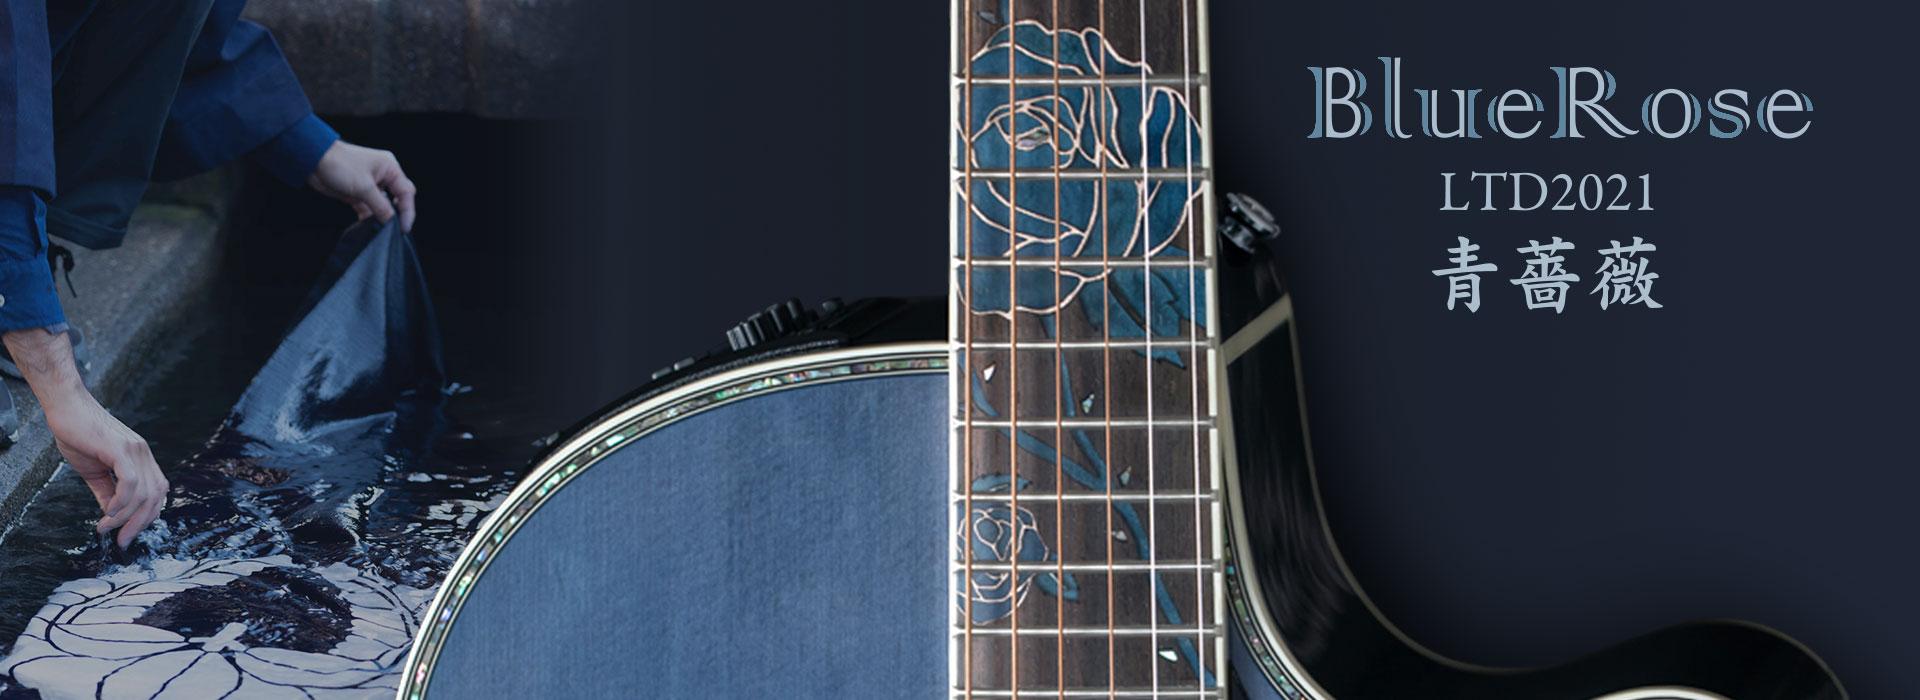 Takamine LTD2021 Blue Rose Header